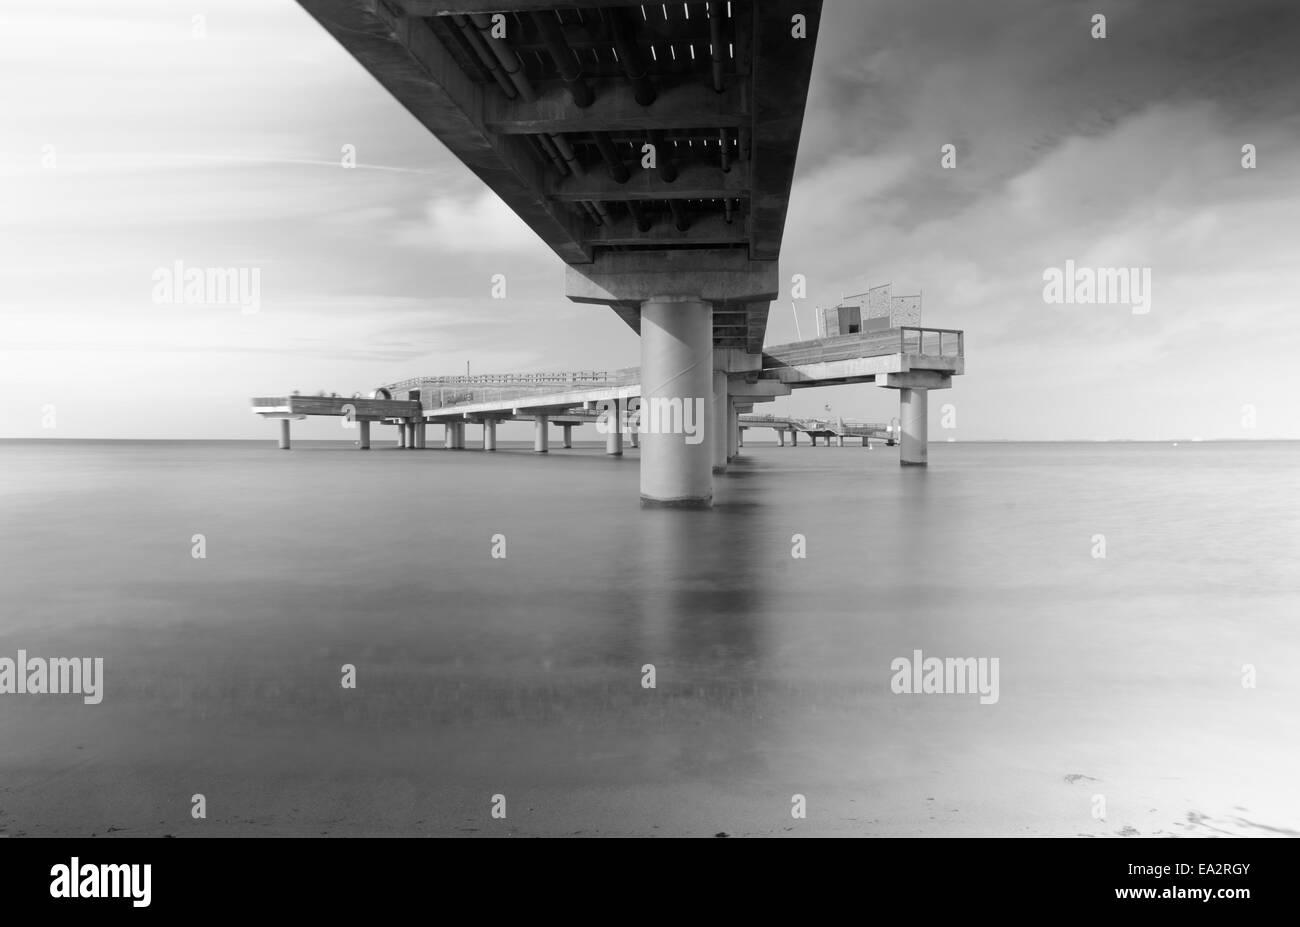 Sea bridge in Germany - Stock Image